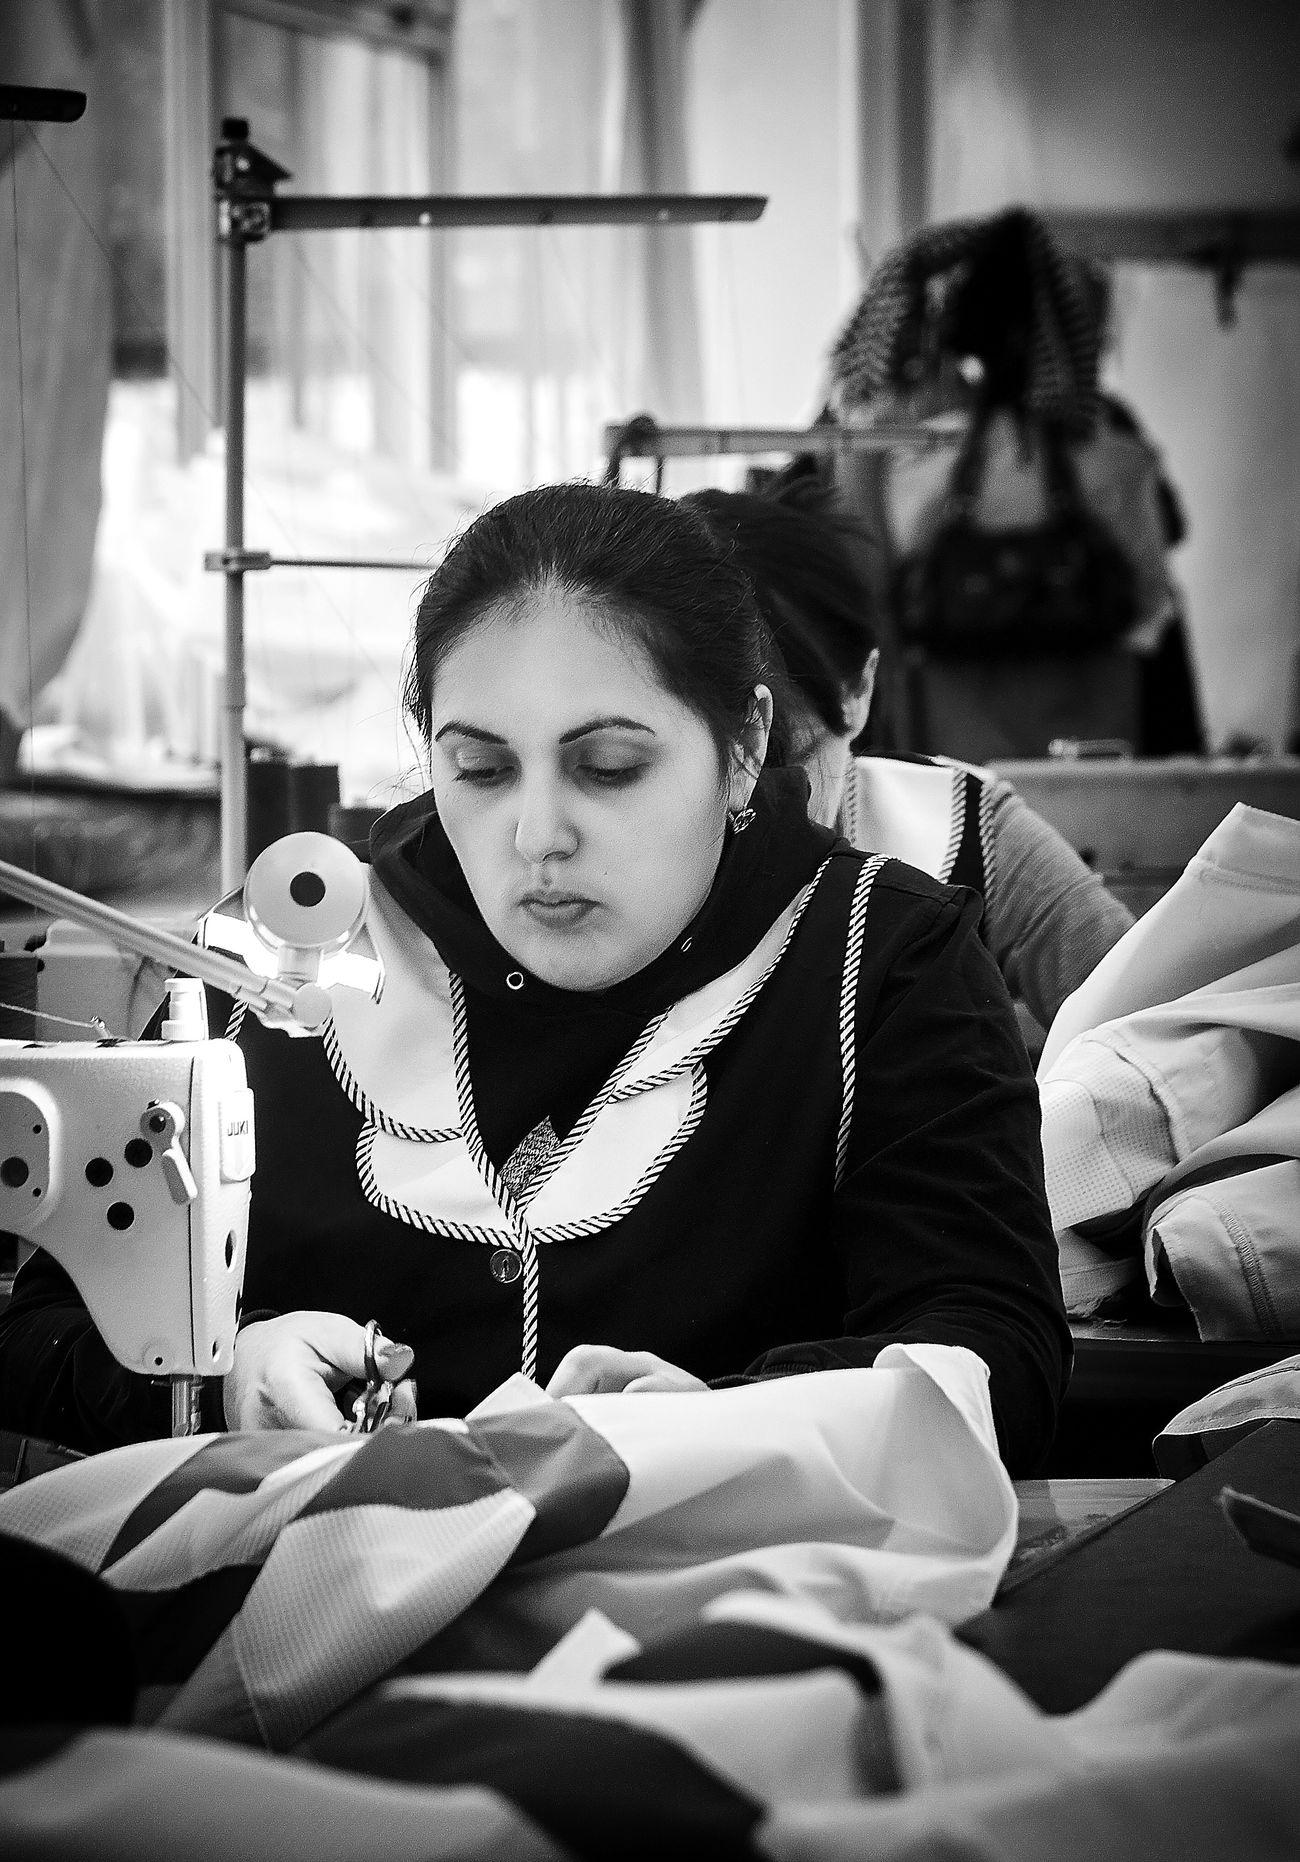 Portrait Russia Blackandwhitephotography Bw_collection Black&white Black And White Photography Blackandwhite Photography Blackandwhite Black & White Black And White Sewing Machine Women Fashion Designer Working